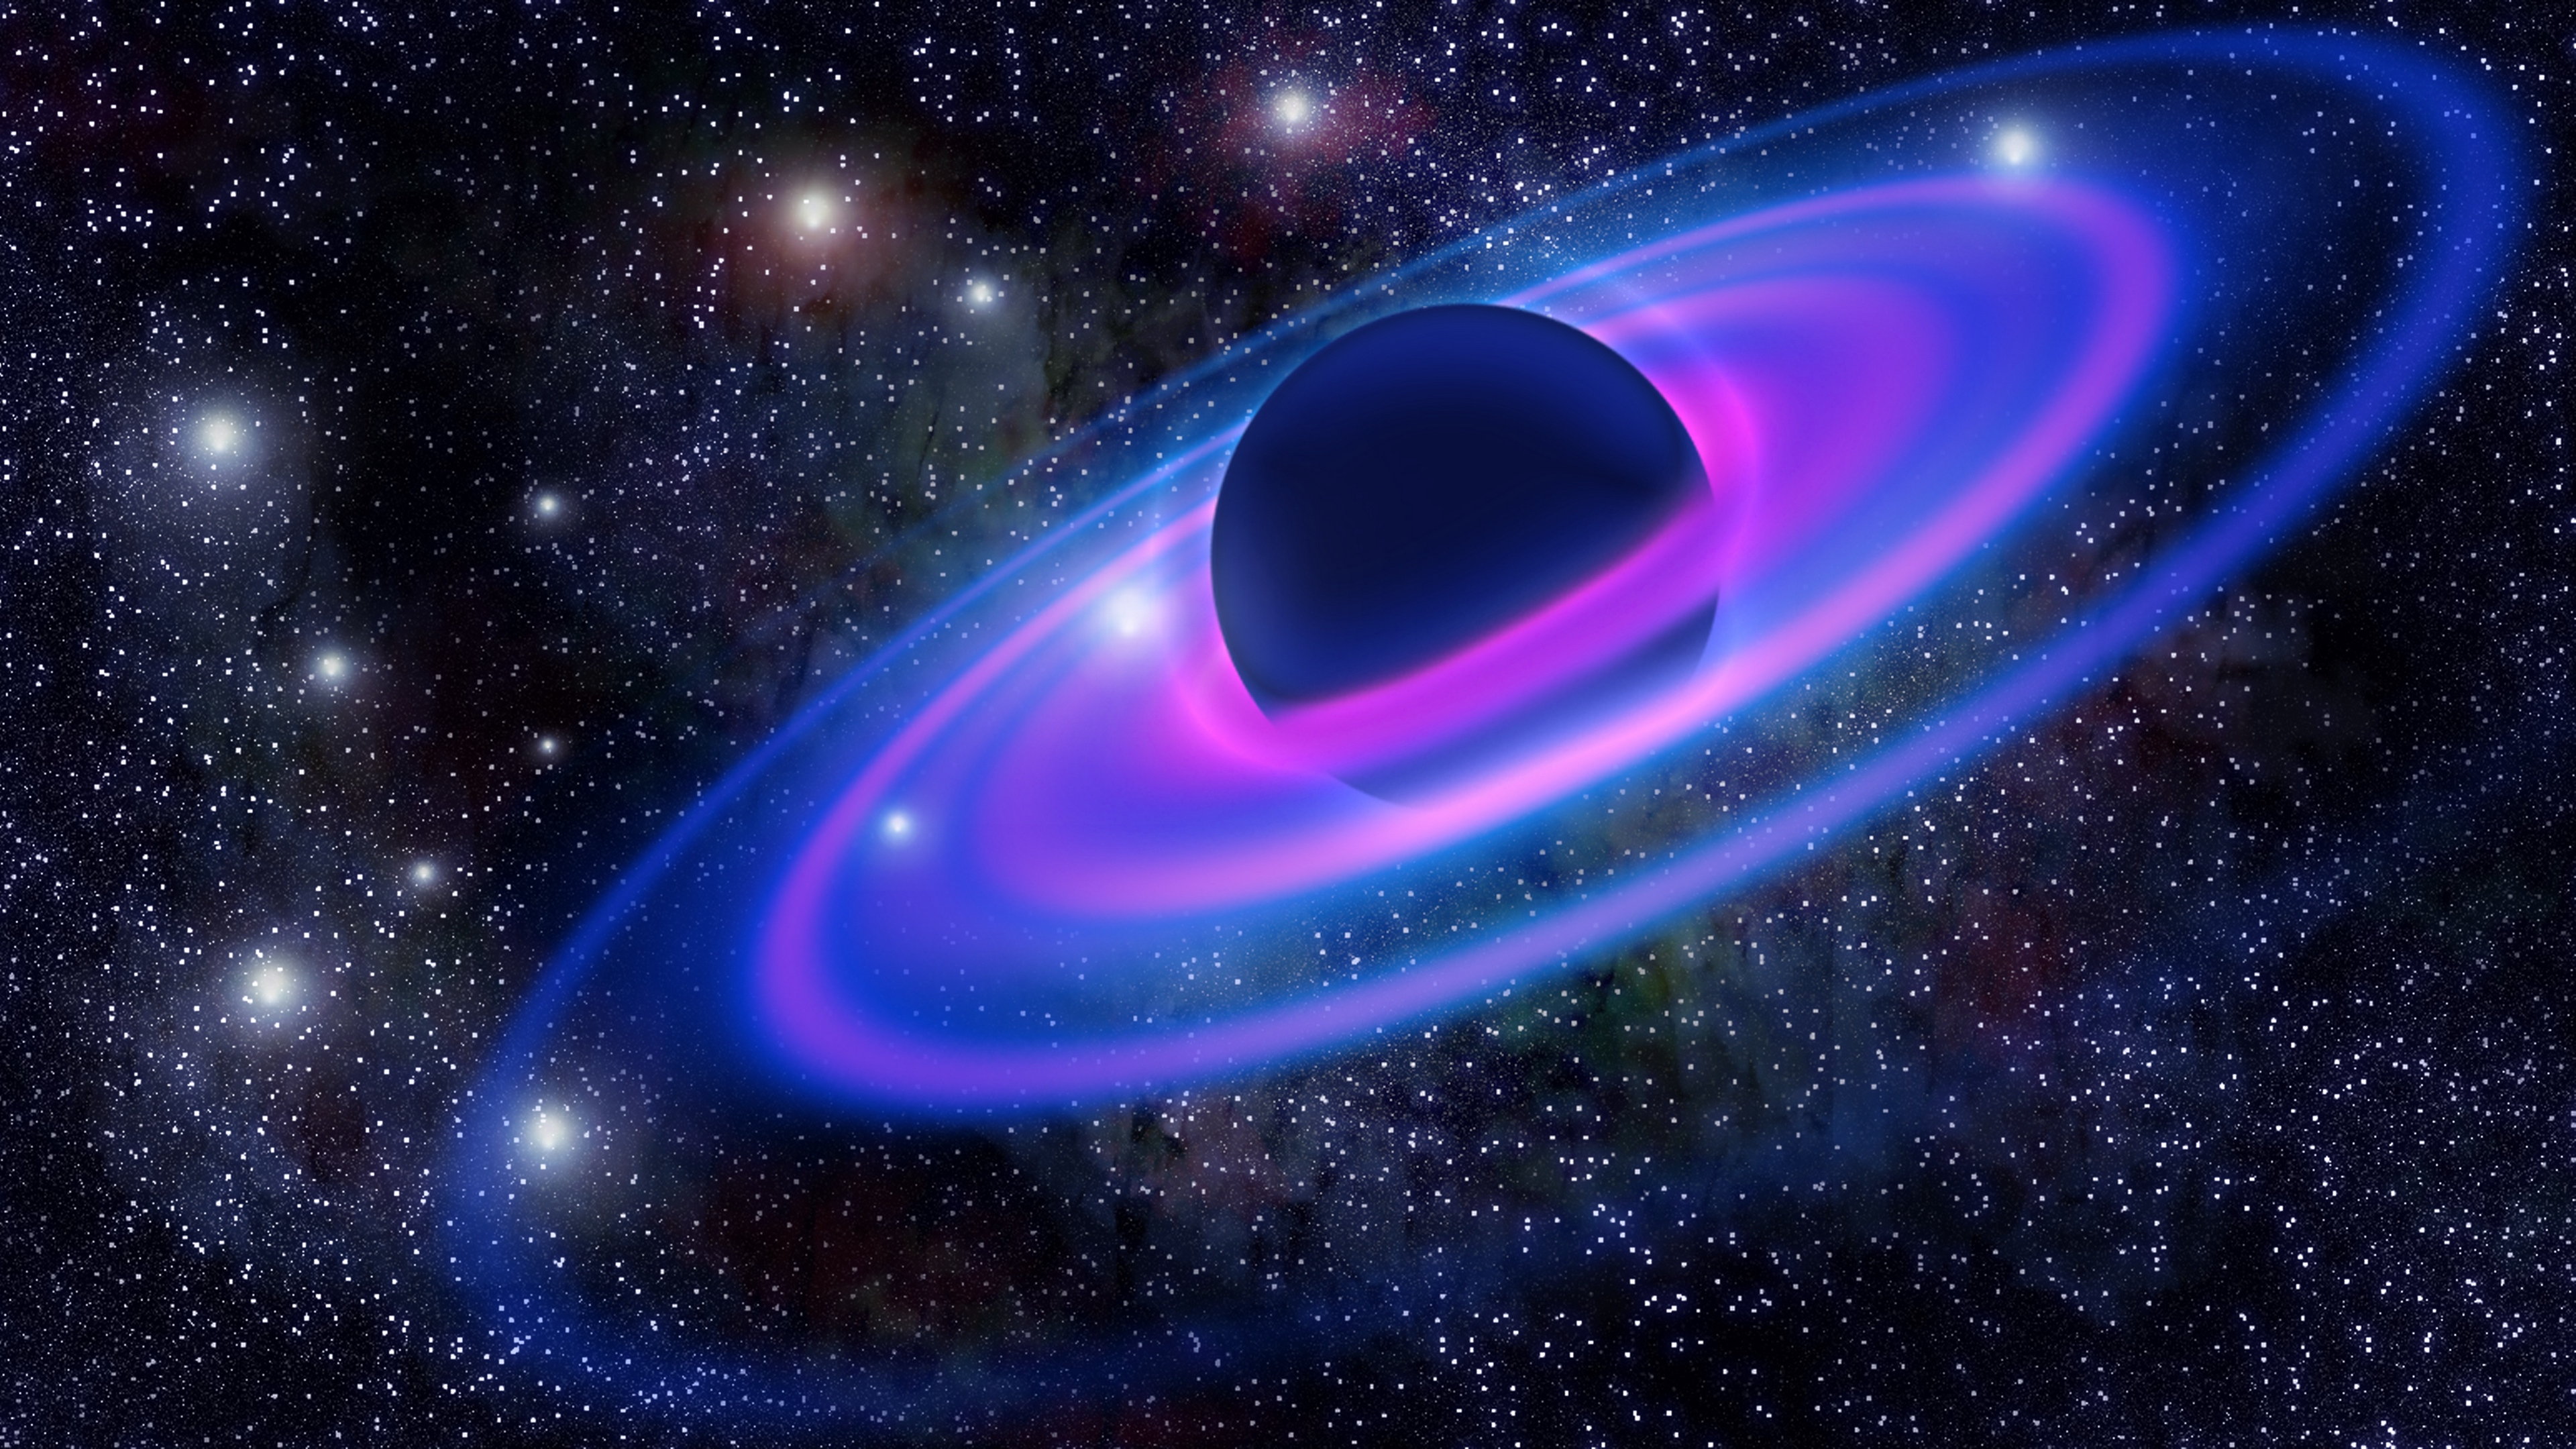 planet galaxy universe stars 4k 1536017110 - planet, galaxy, universe, stars 4k - Universe, Planet, Galaxy